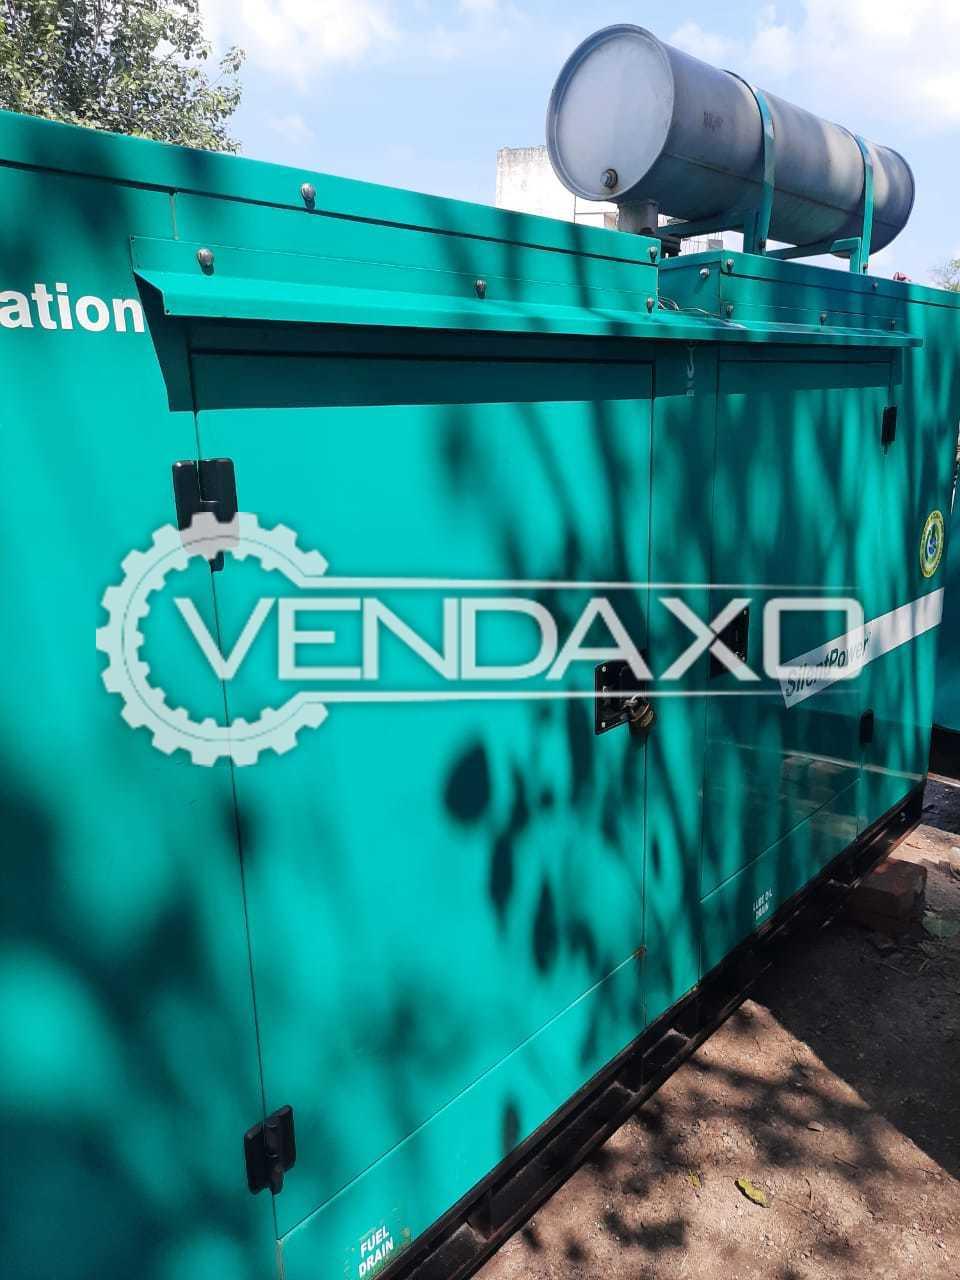 Cummins Sudhir CJ62.5D5P Diesel Generator - 62.5 Kva, 2018 Model